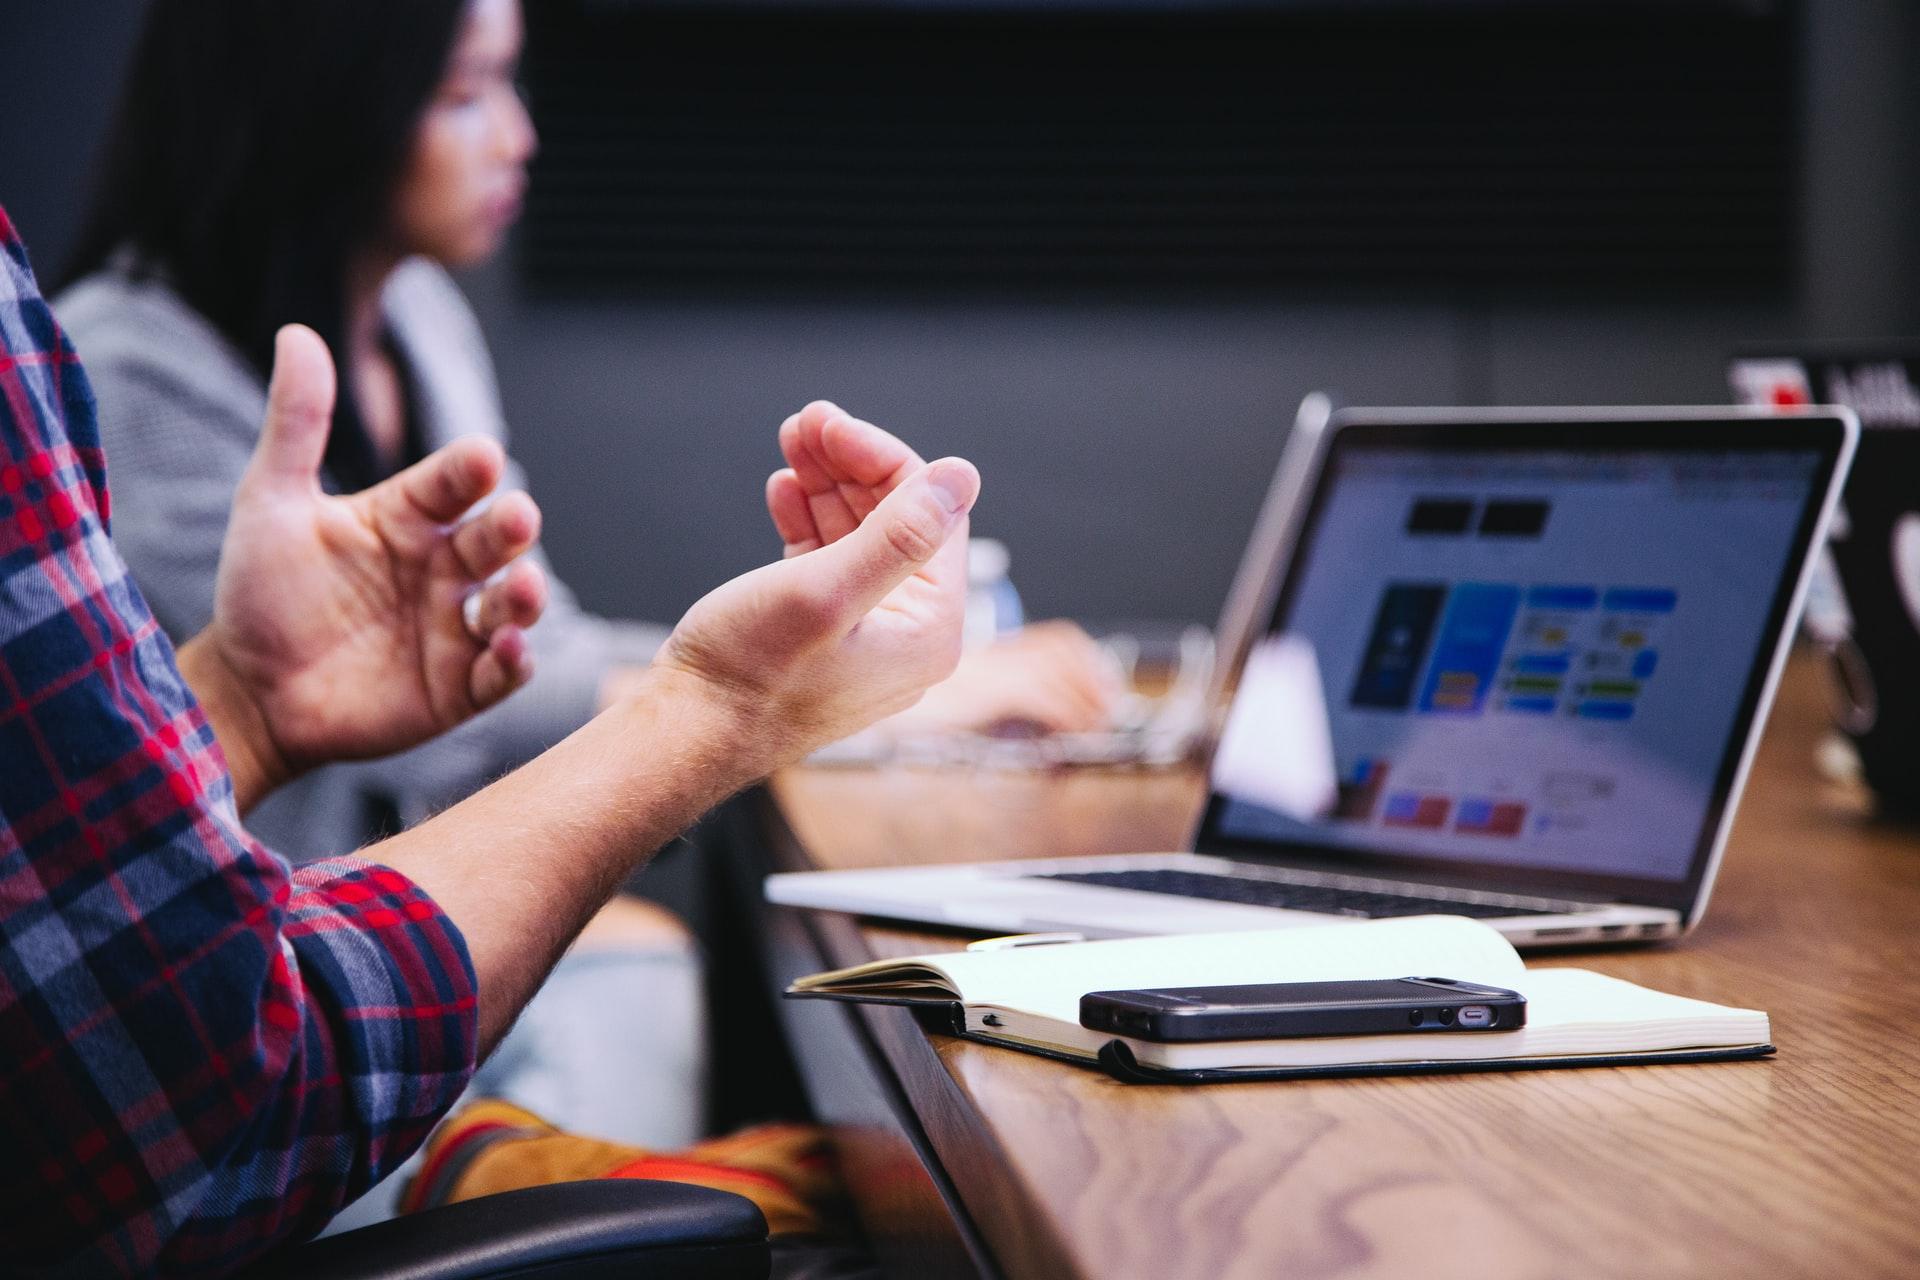 apprenticeships in tech